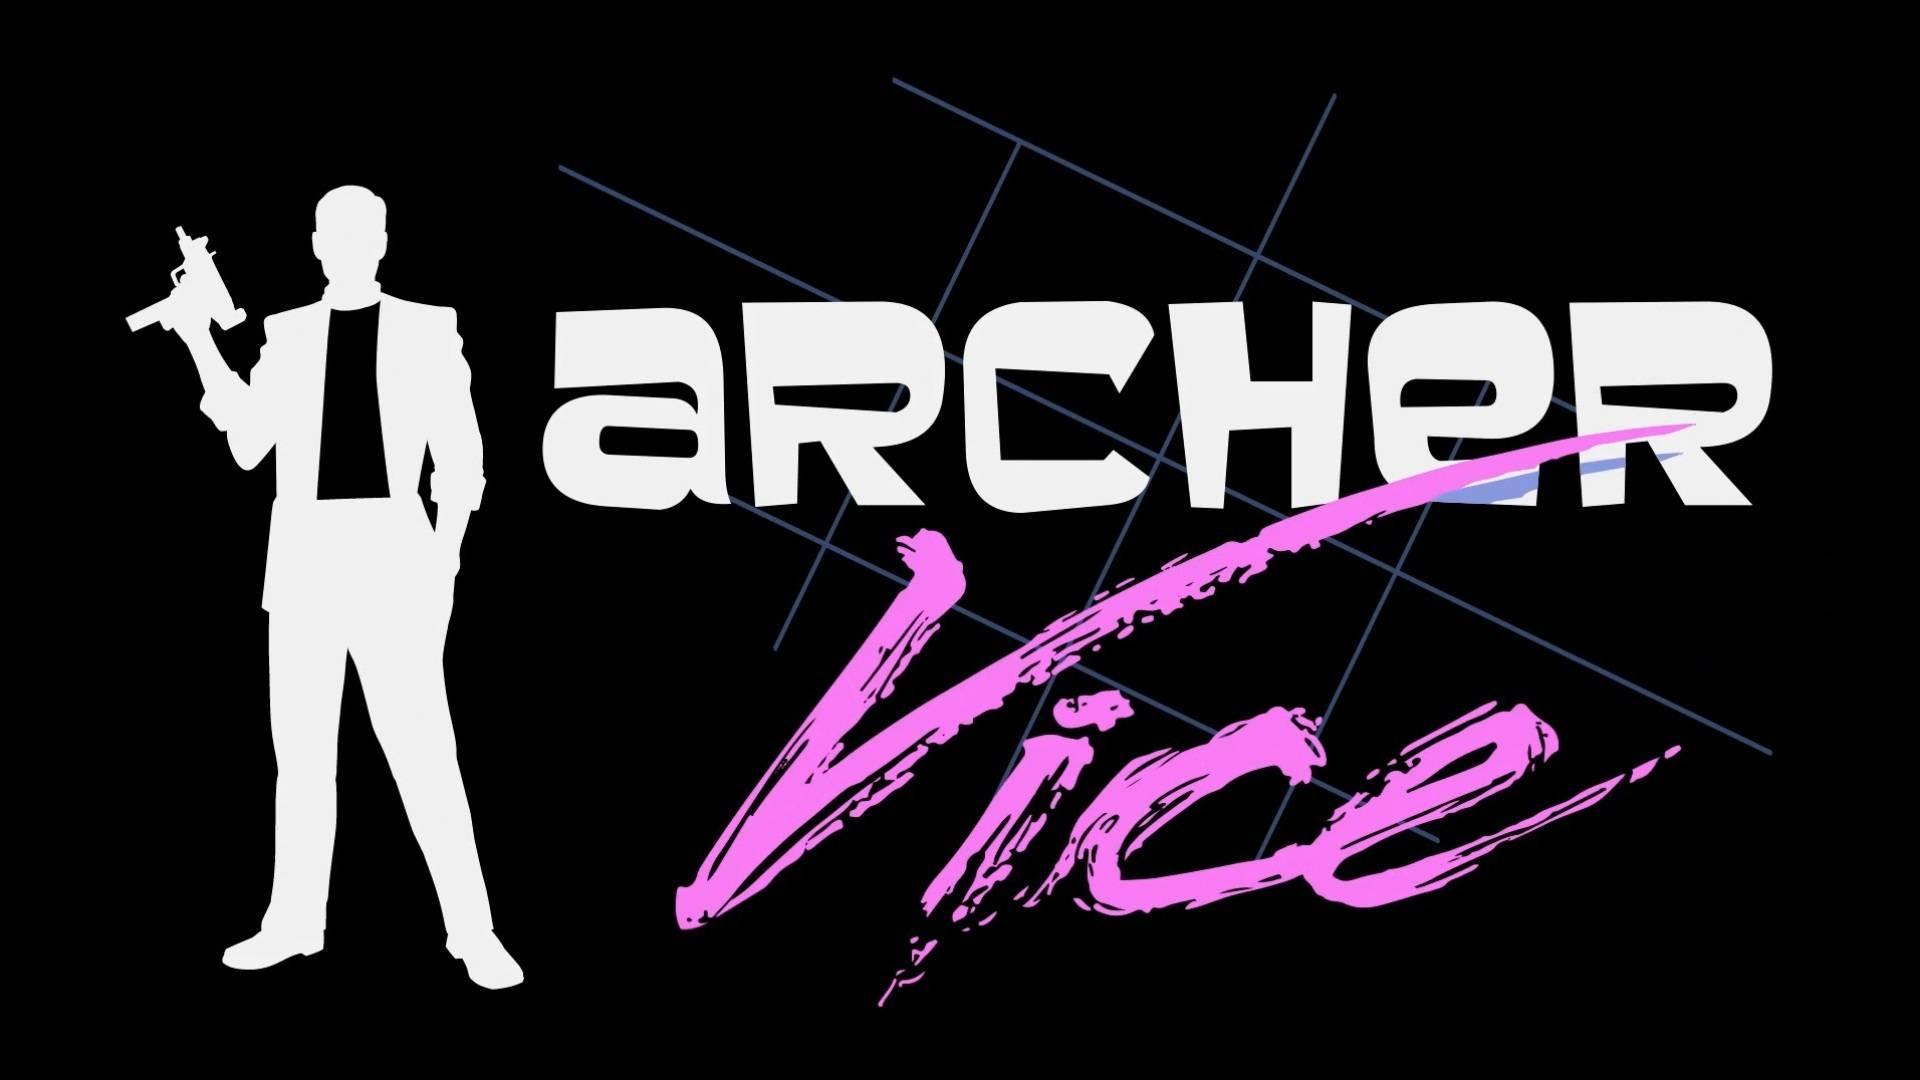 Archer Wallpapers - WallpaperSafari